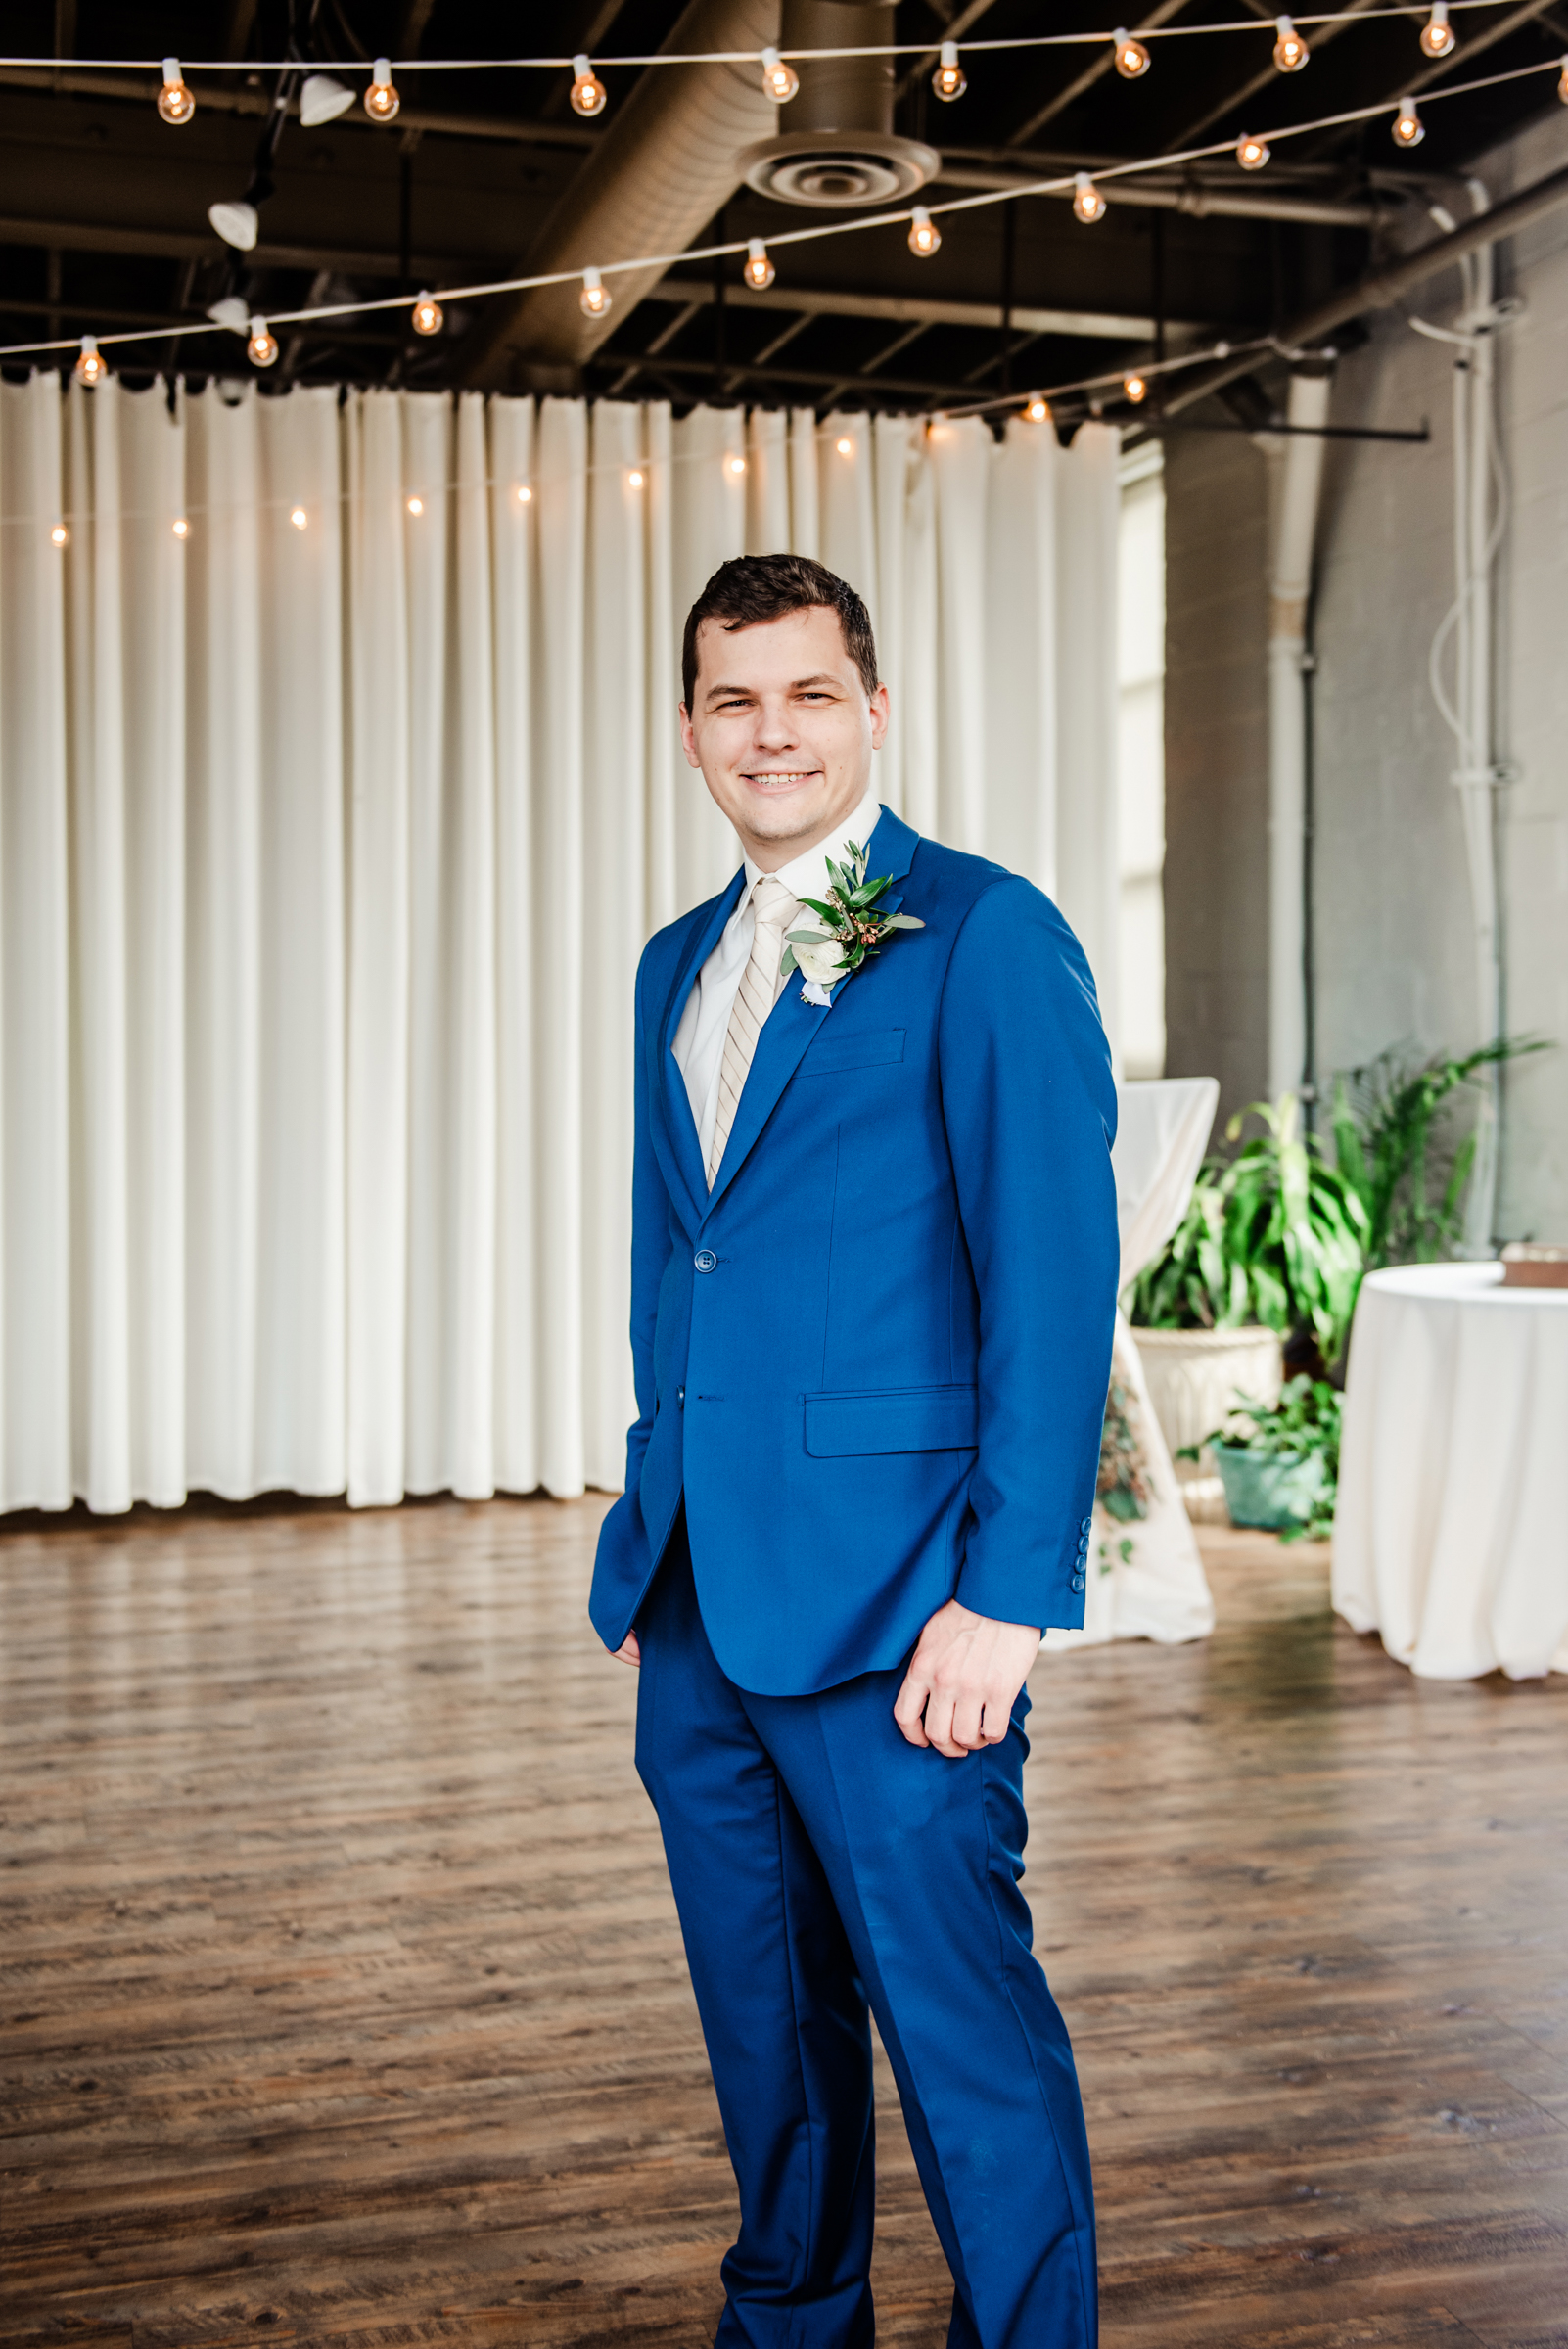 The_Arbor_LoftRochester_Wedding_JILL_STUDIO_Rochester_NY_Photographer_161544.jpg